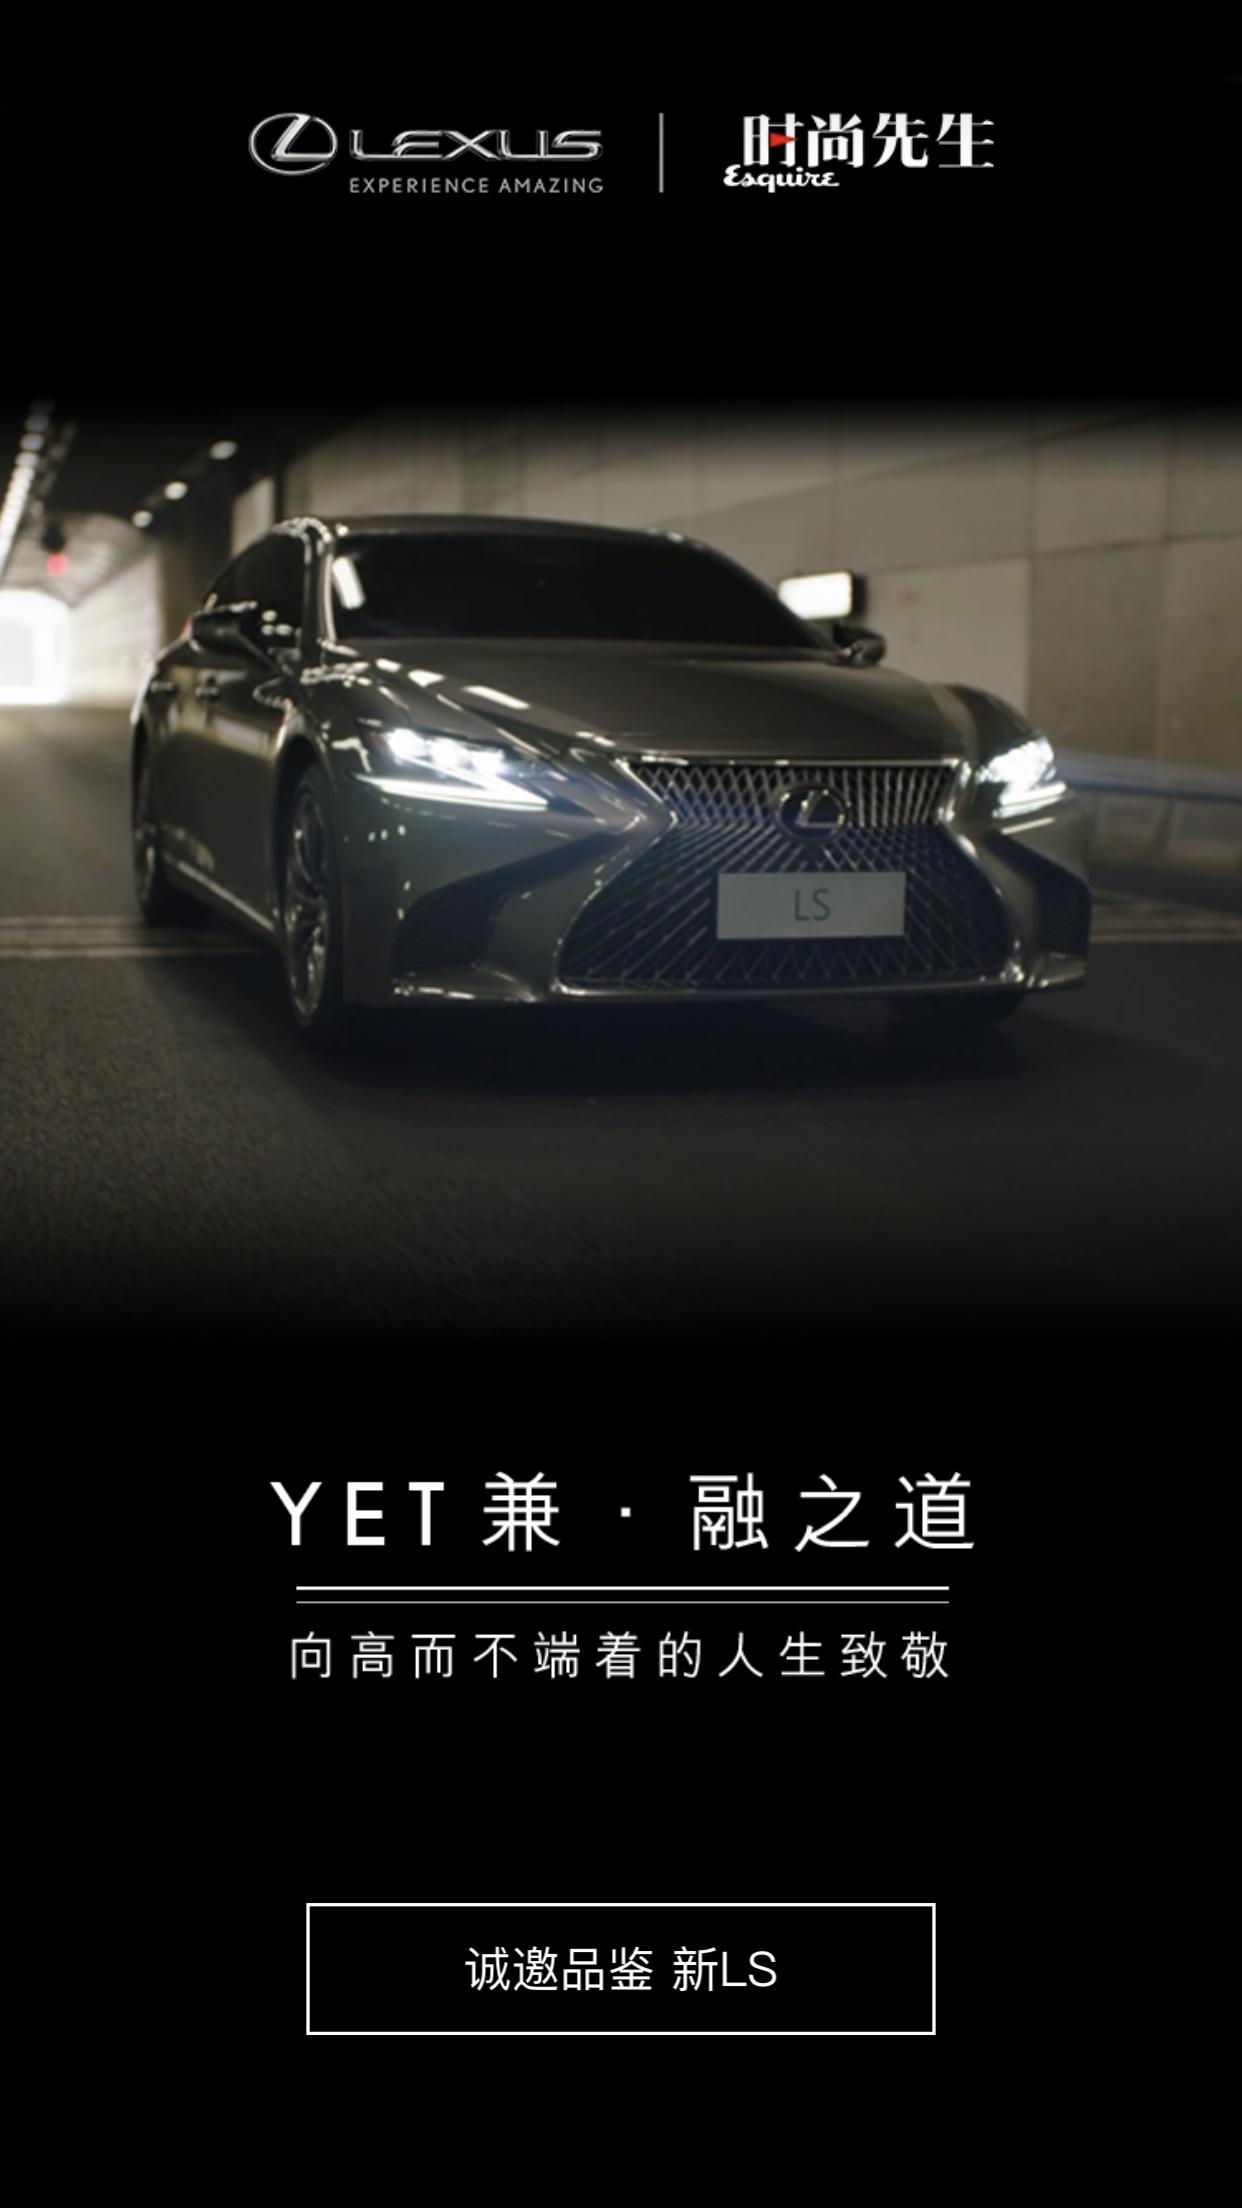 lexus-huangbo-4